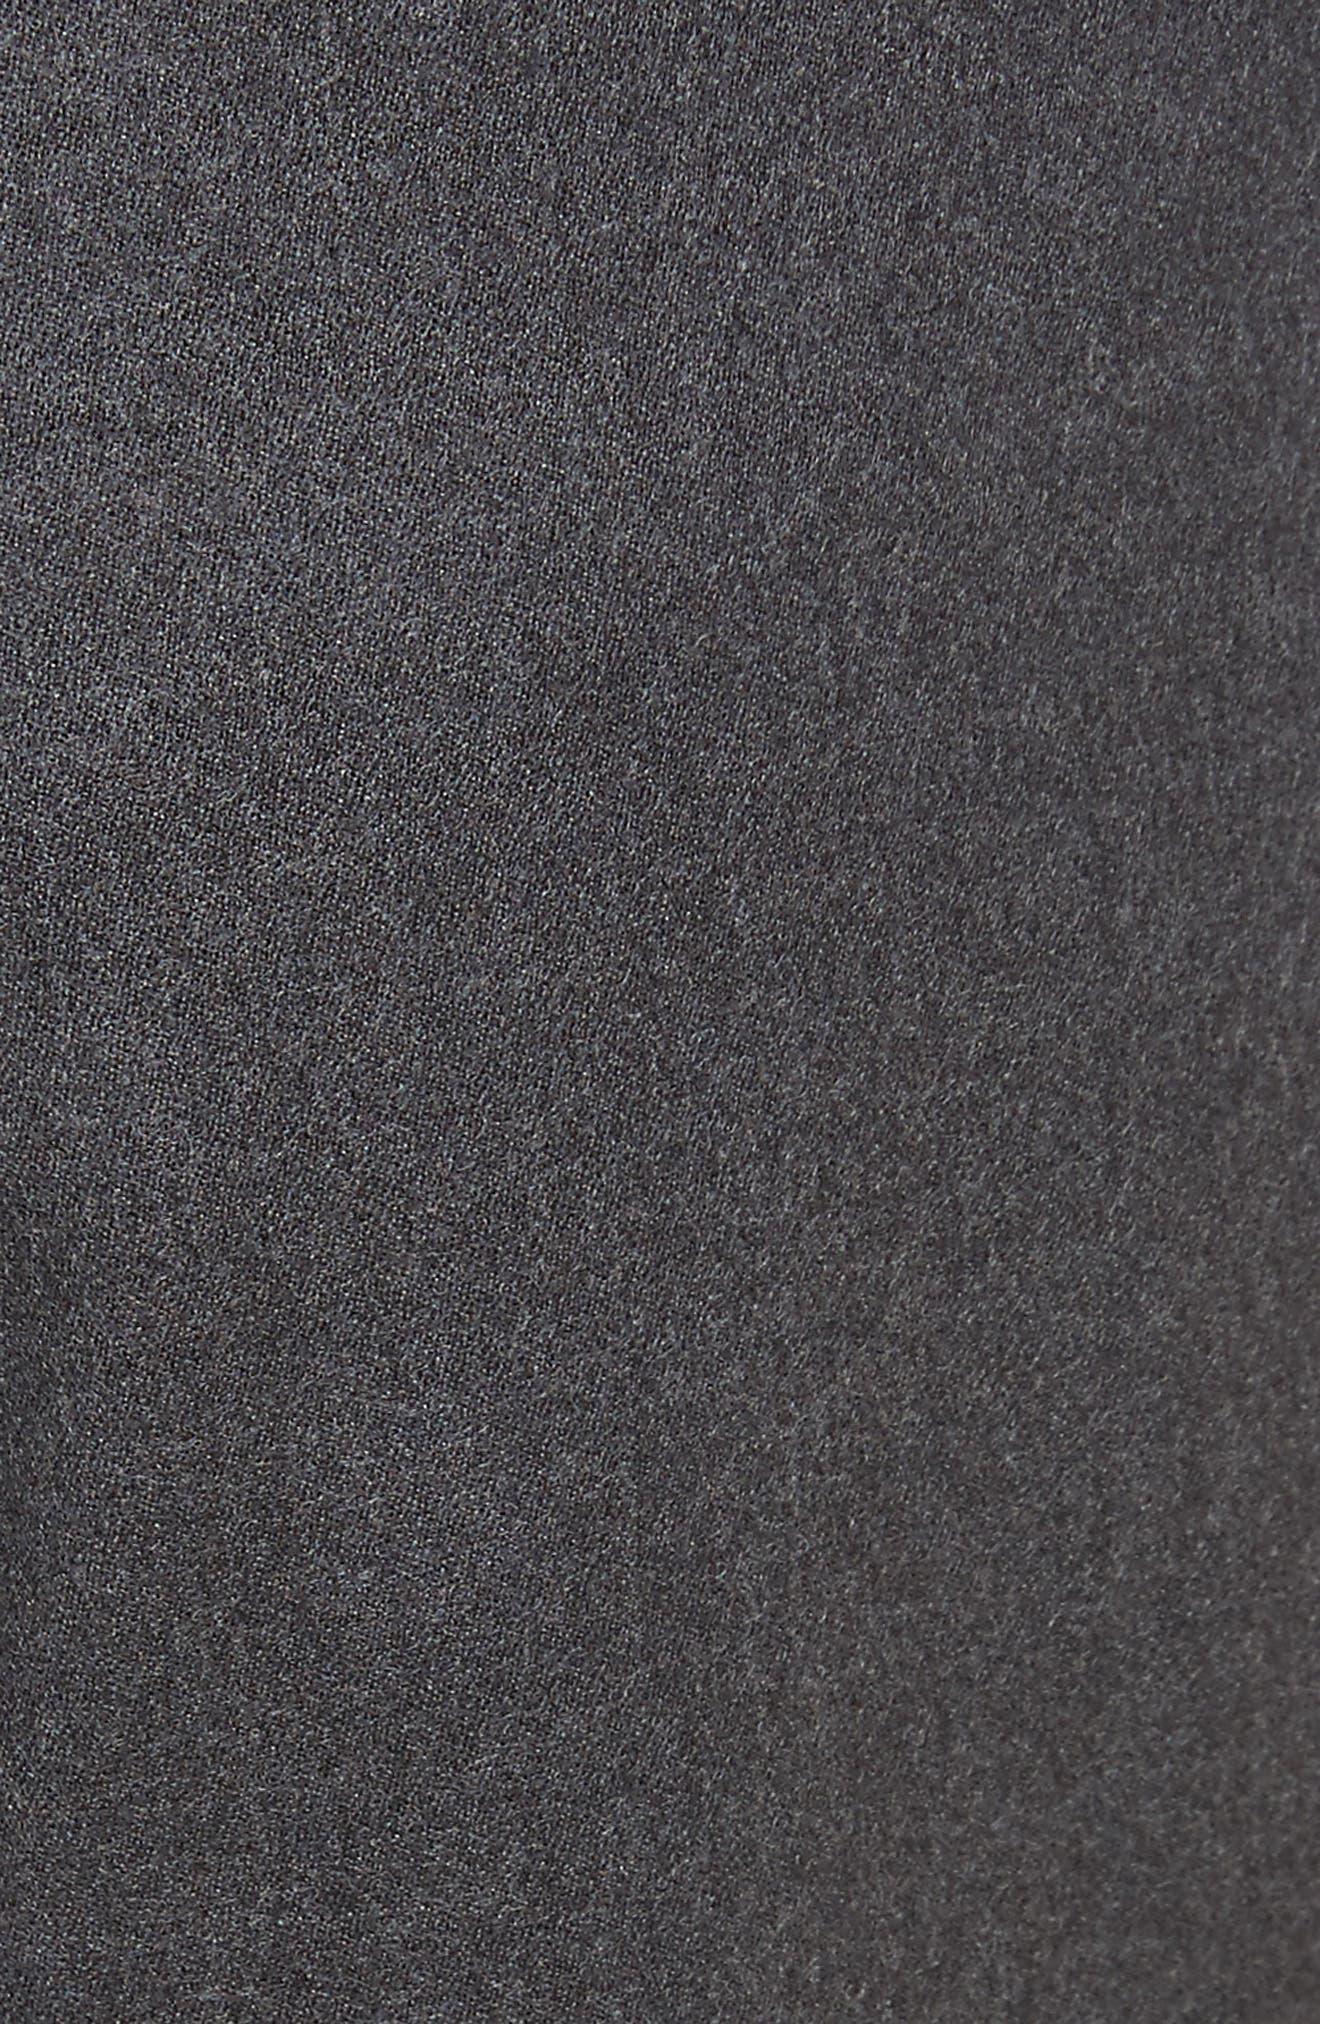 Regular Fit Wool Cargo Trousers,                             Alternate thumbnail 5, color,                             Dark Grey Solid